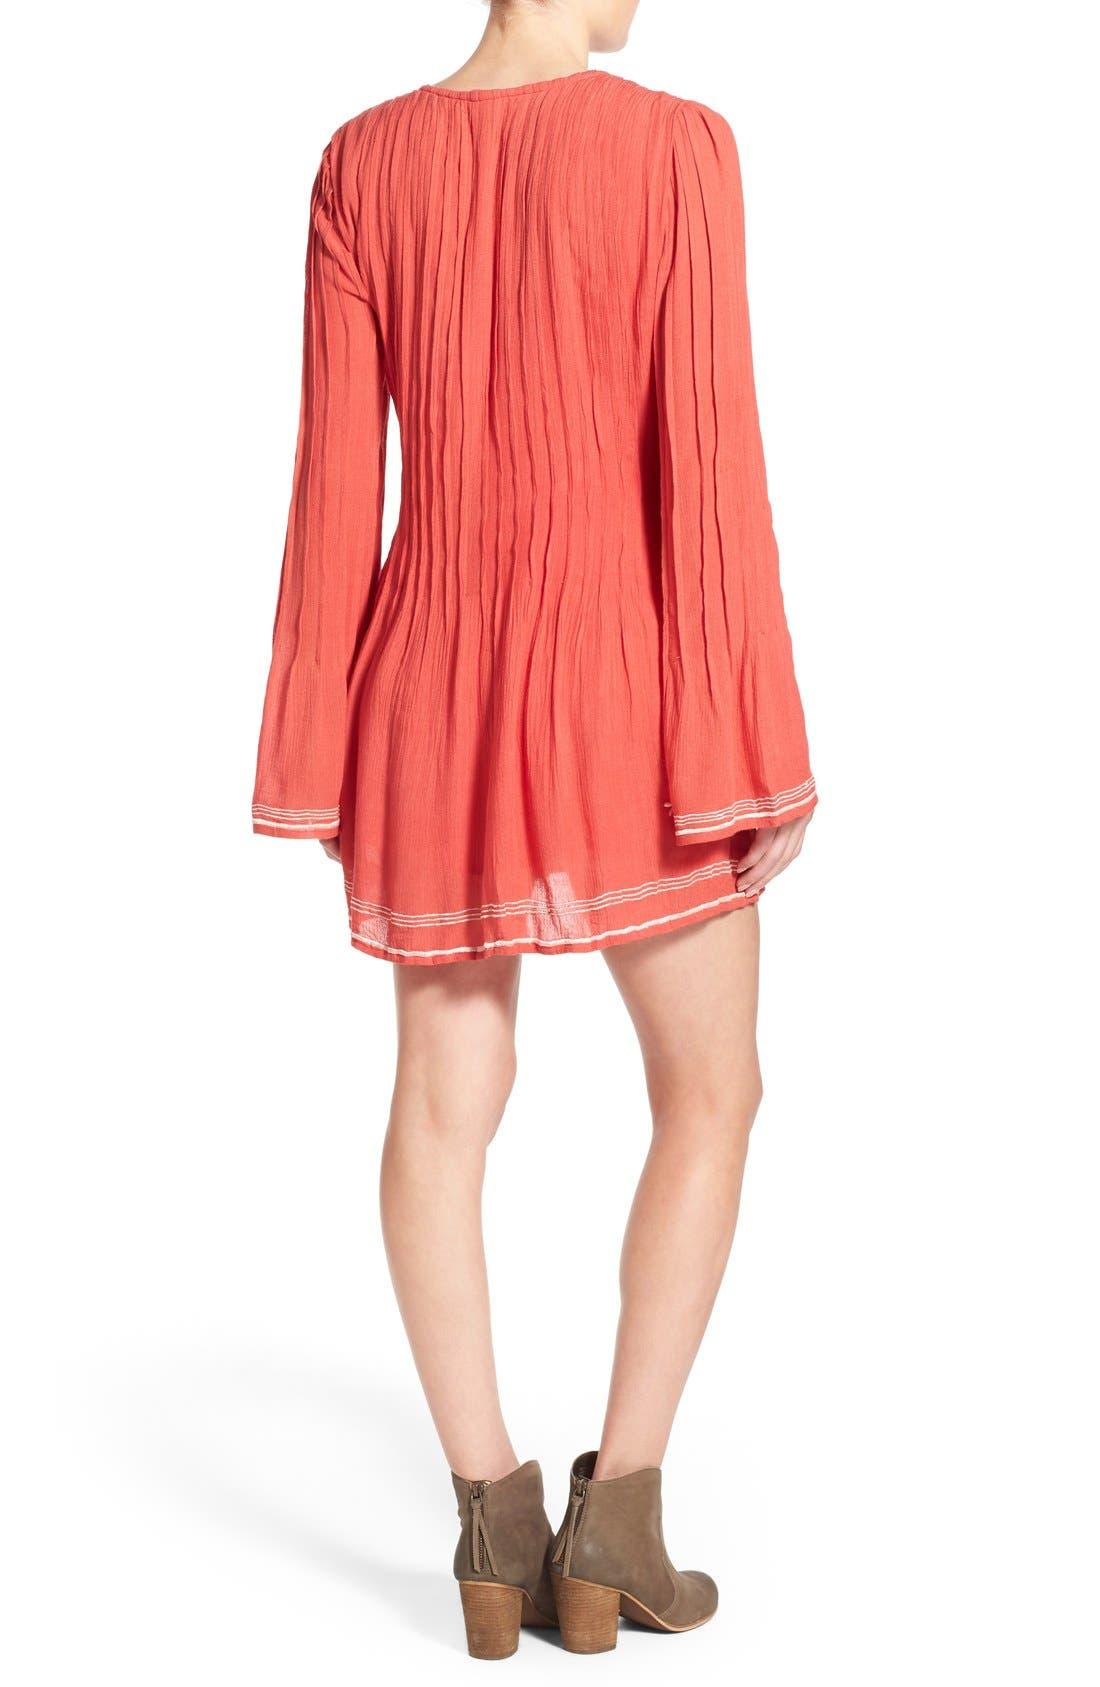 TULAROSA, 'Audrey' Embroidered Tunic Dress, Alternate thumbnail 2, color, 650